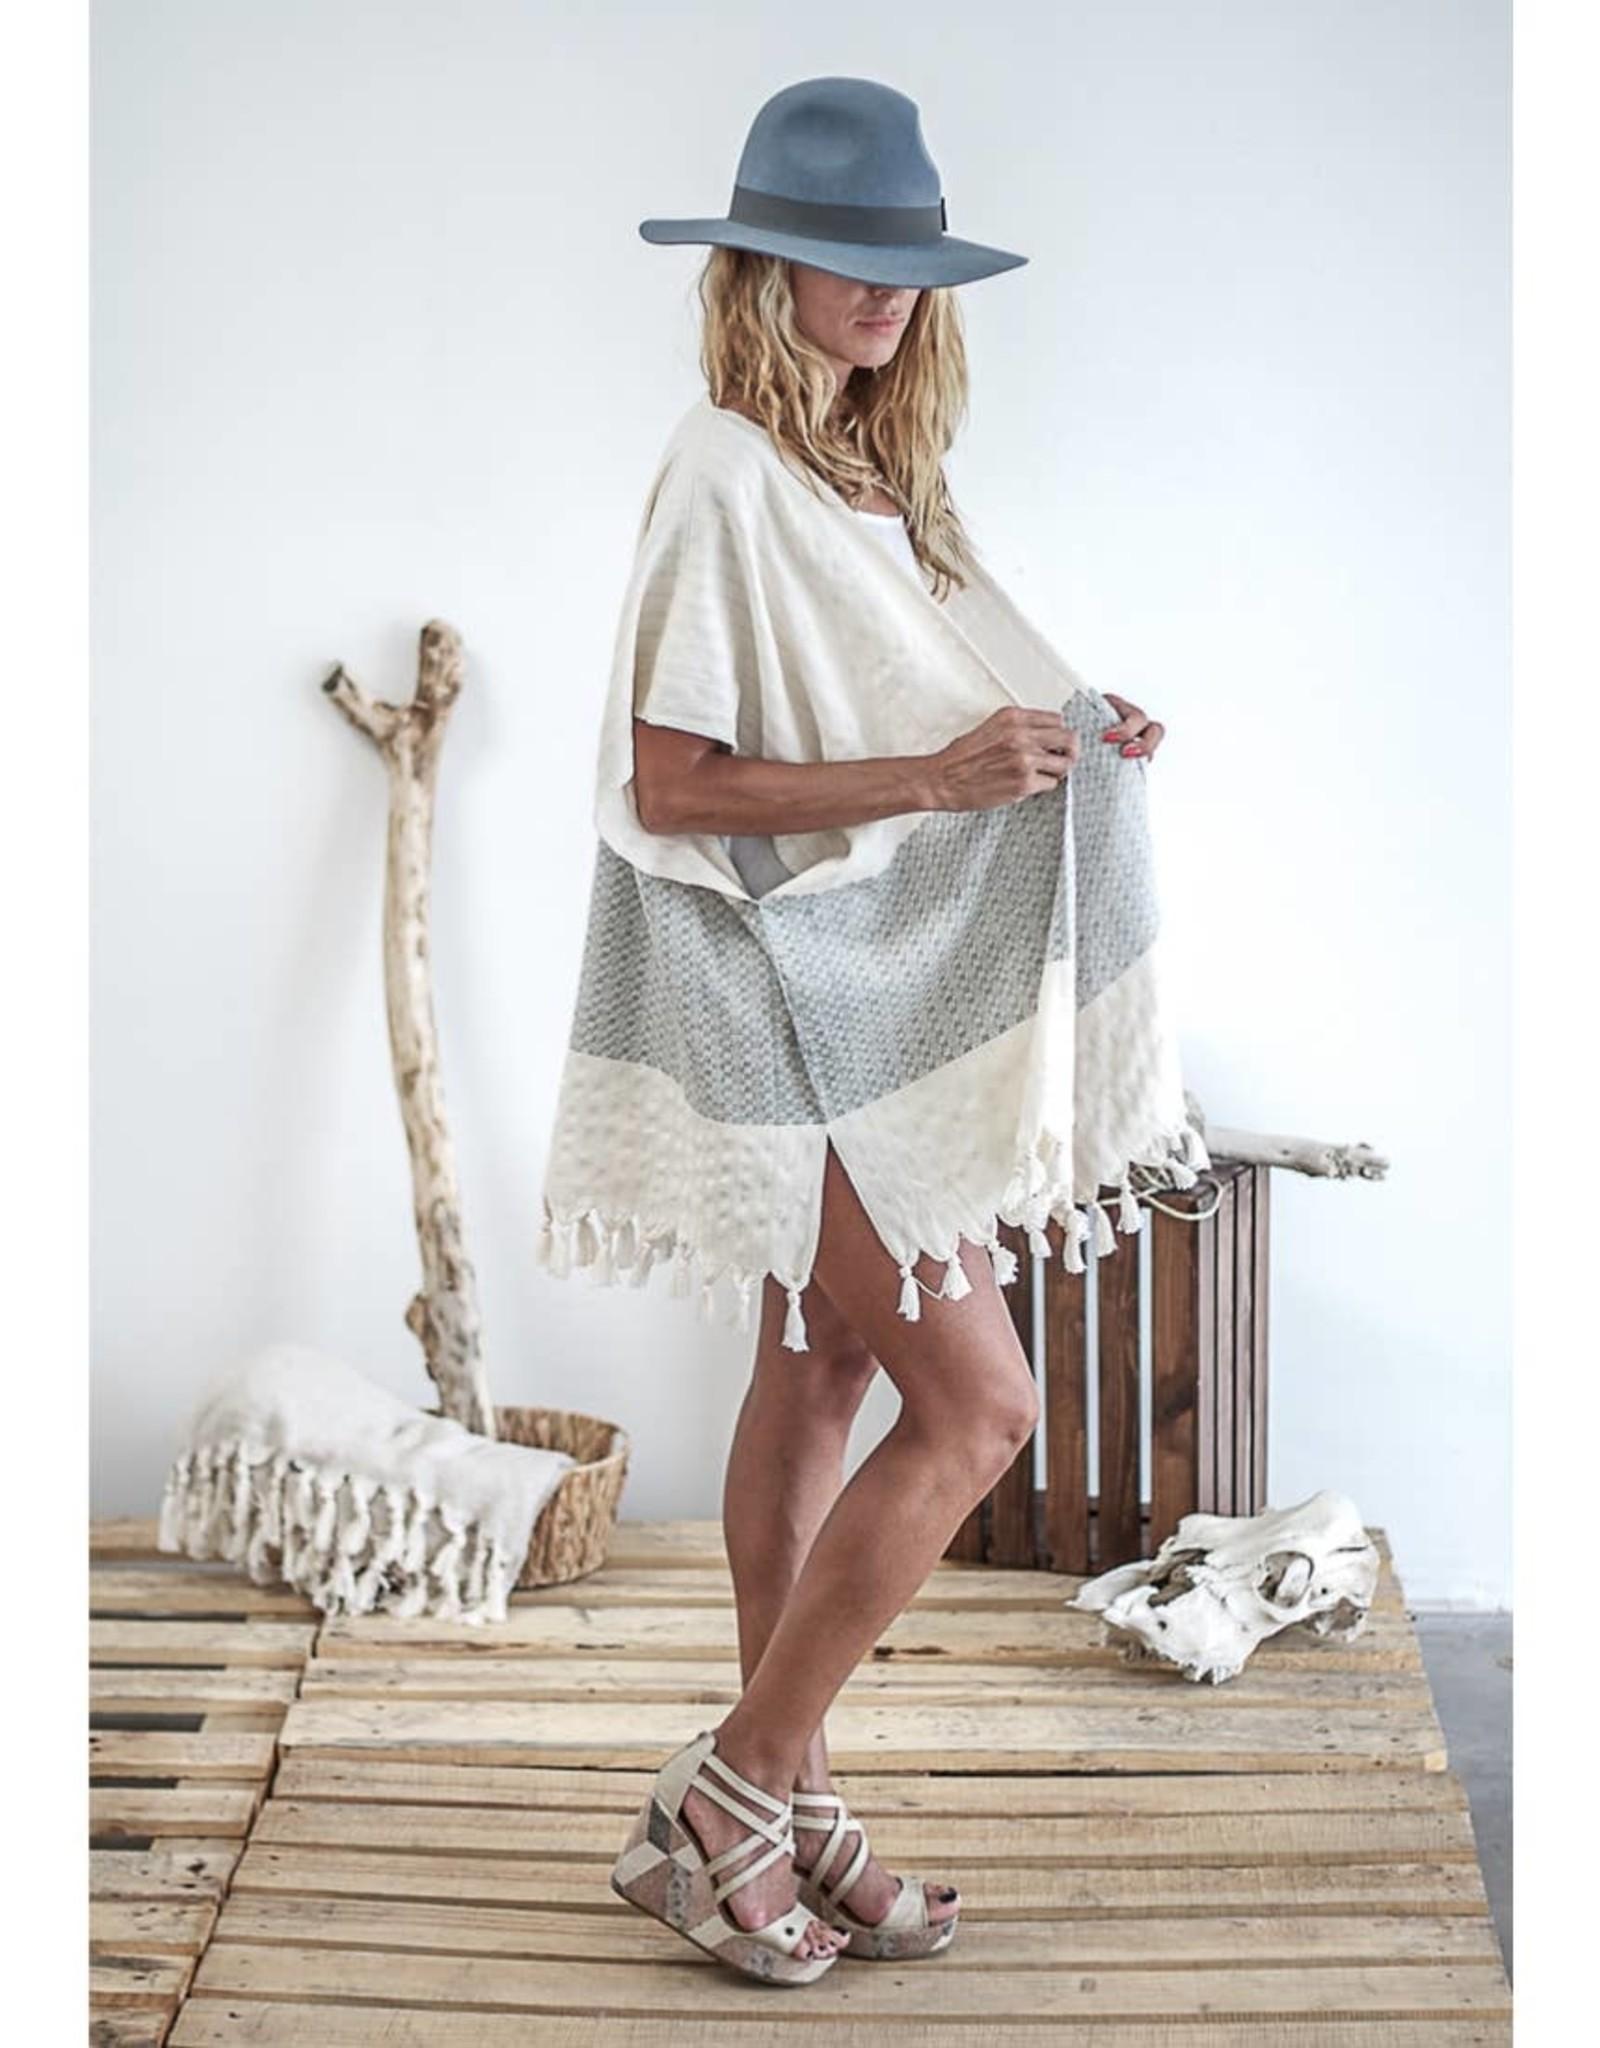 The Handloom Pamuk Kimono